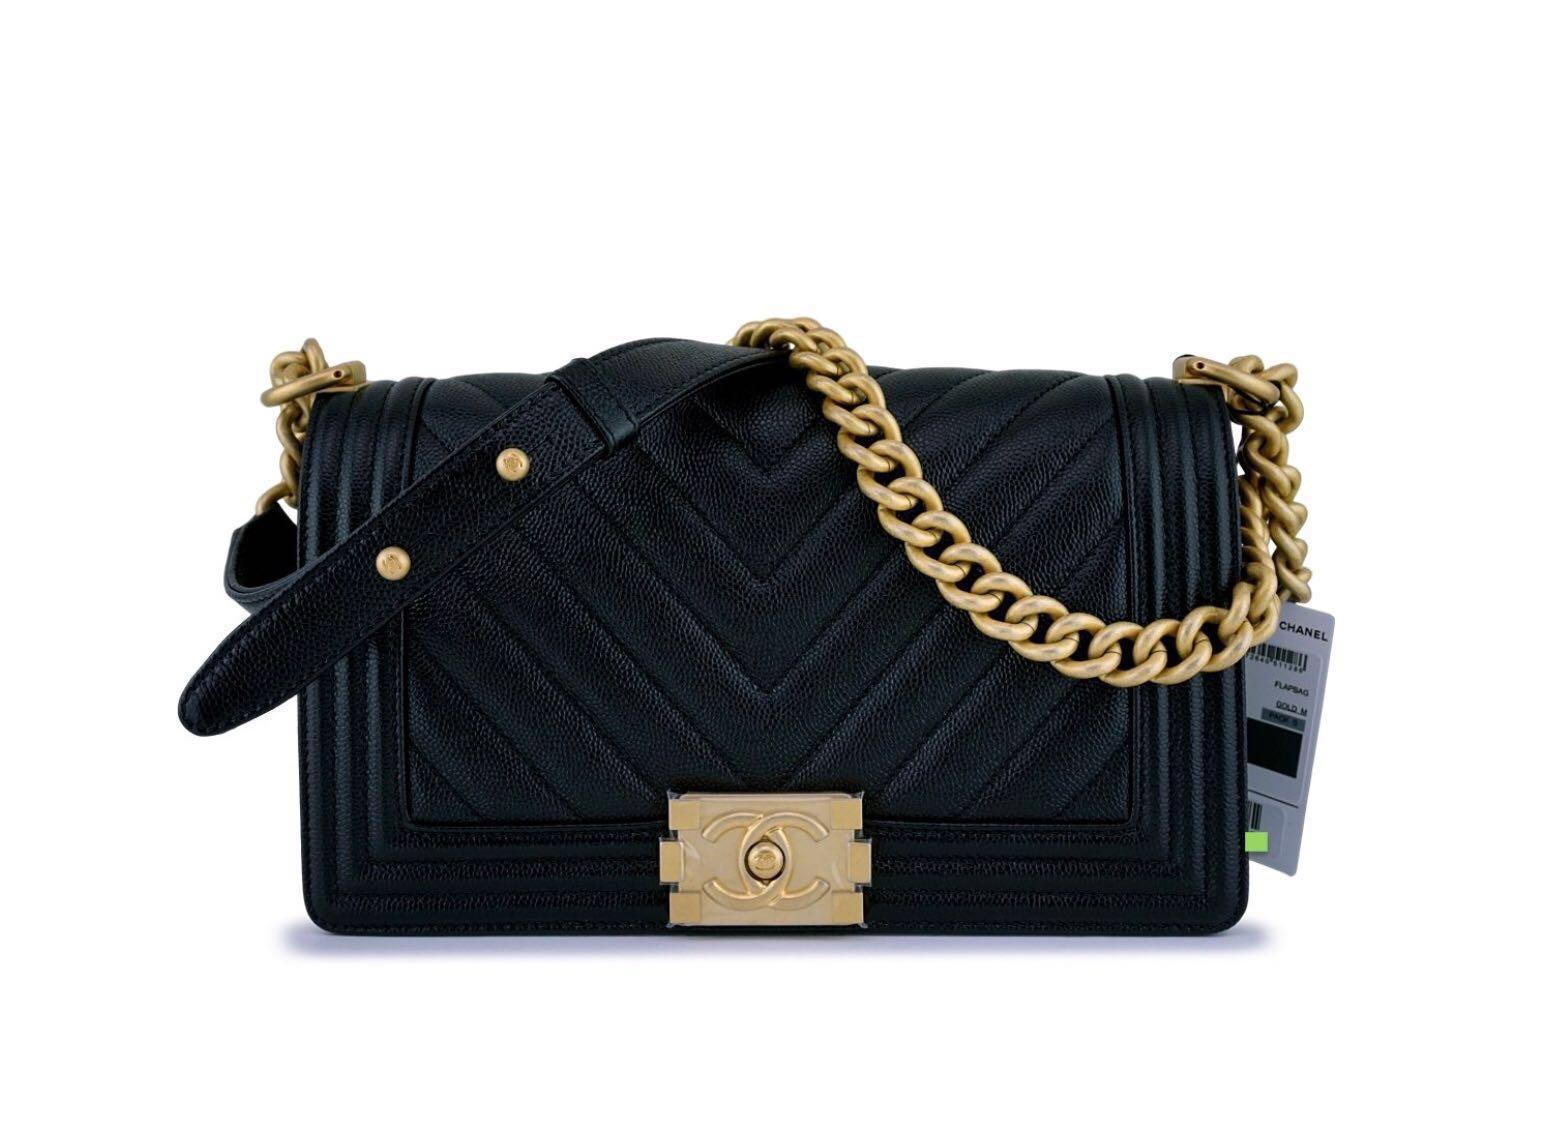 6ad2d51b02ea85 Authentic Chanel Black Caviar Chevron Old Medium Classic Boy Flap ...